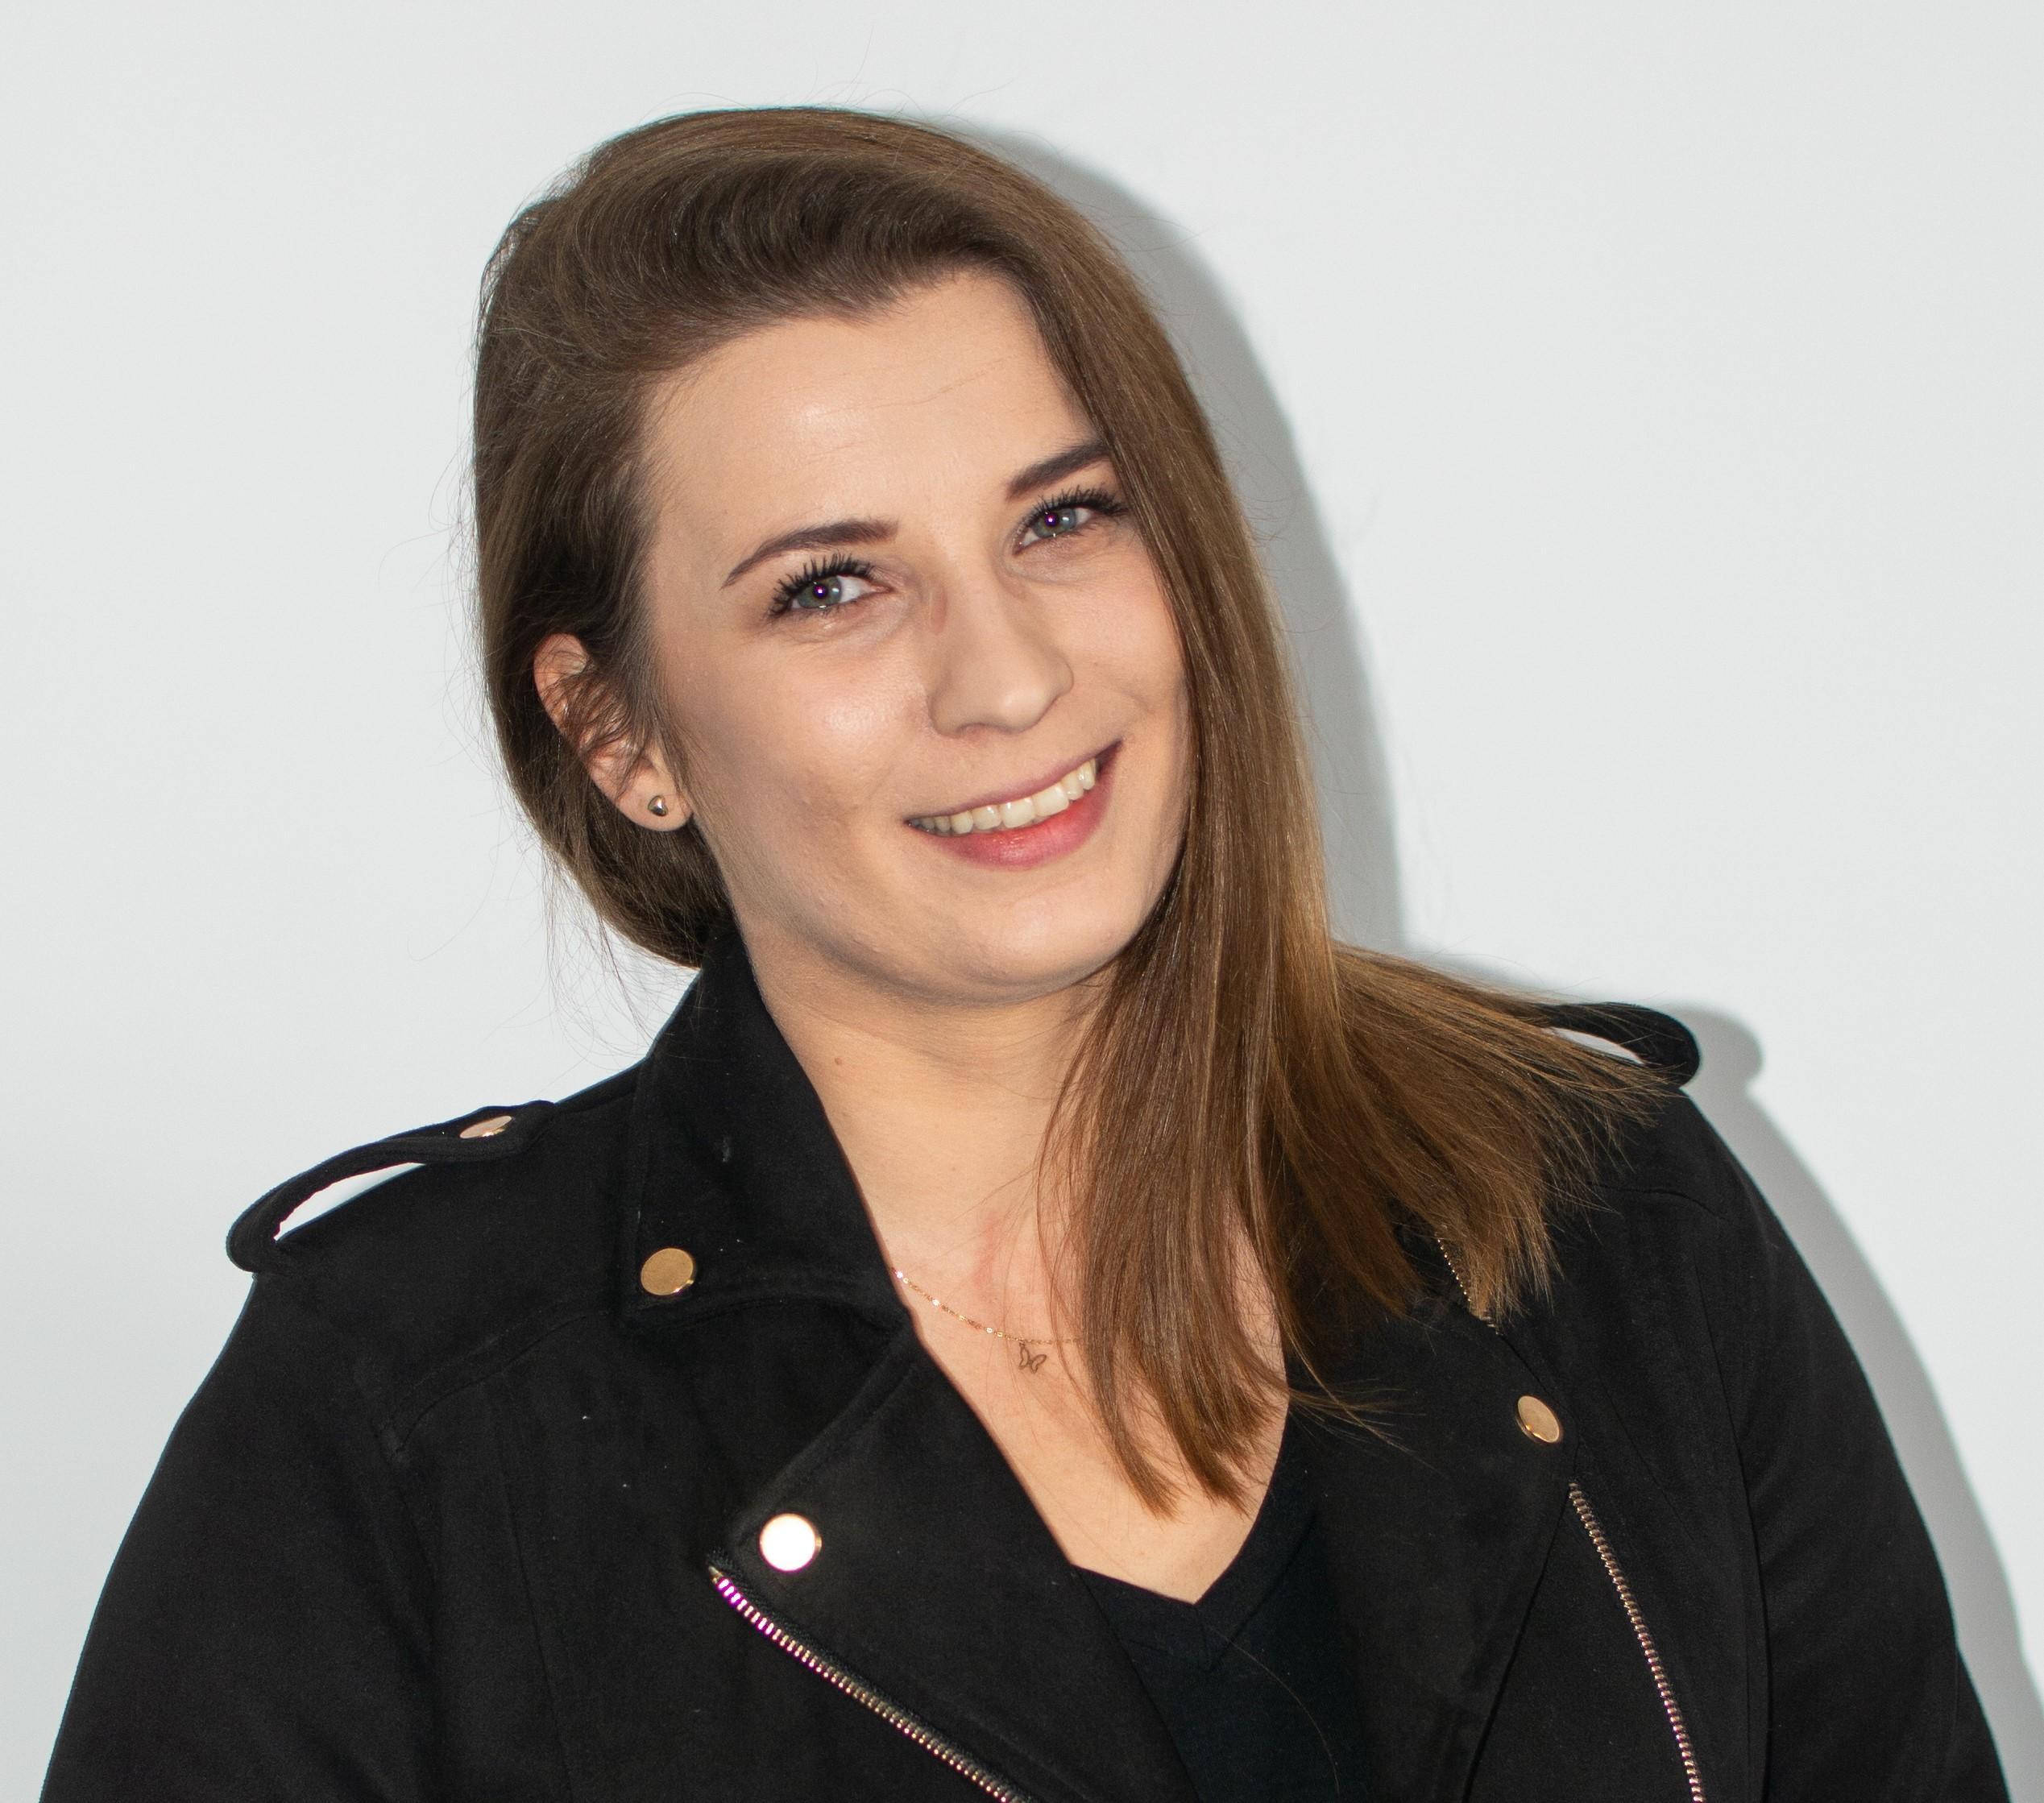 Izabela Pastewska